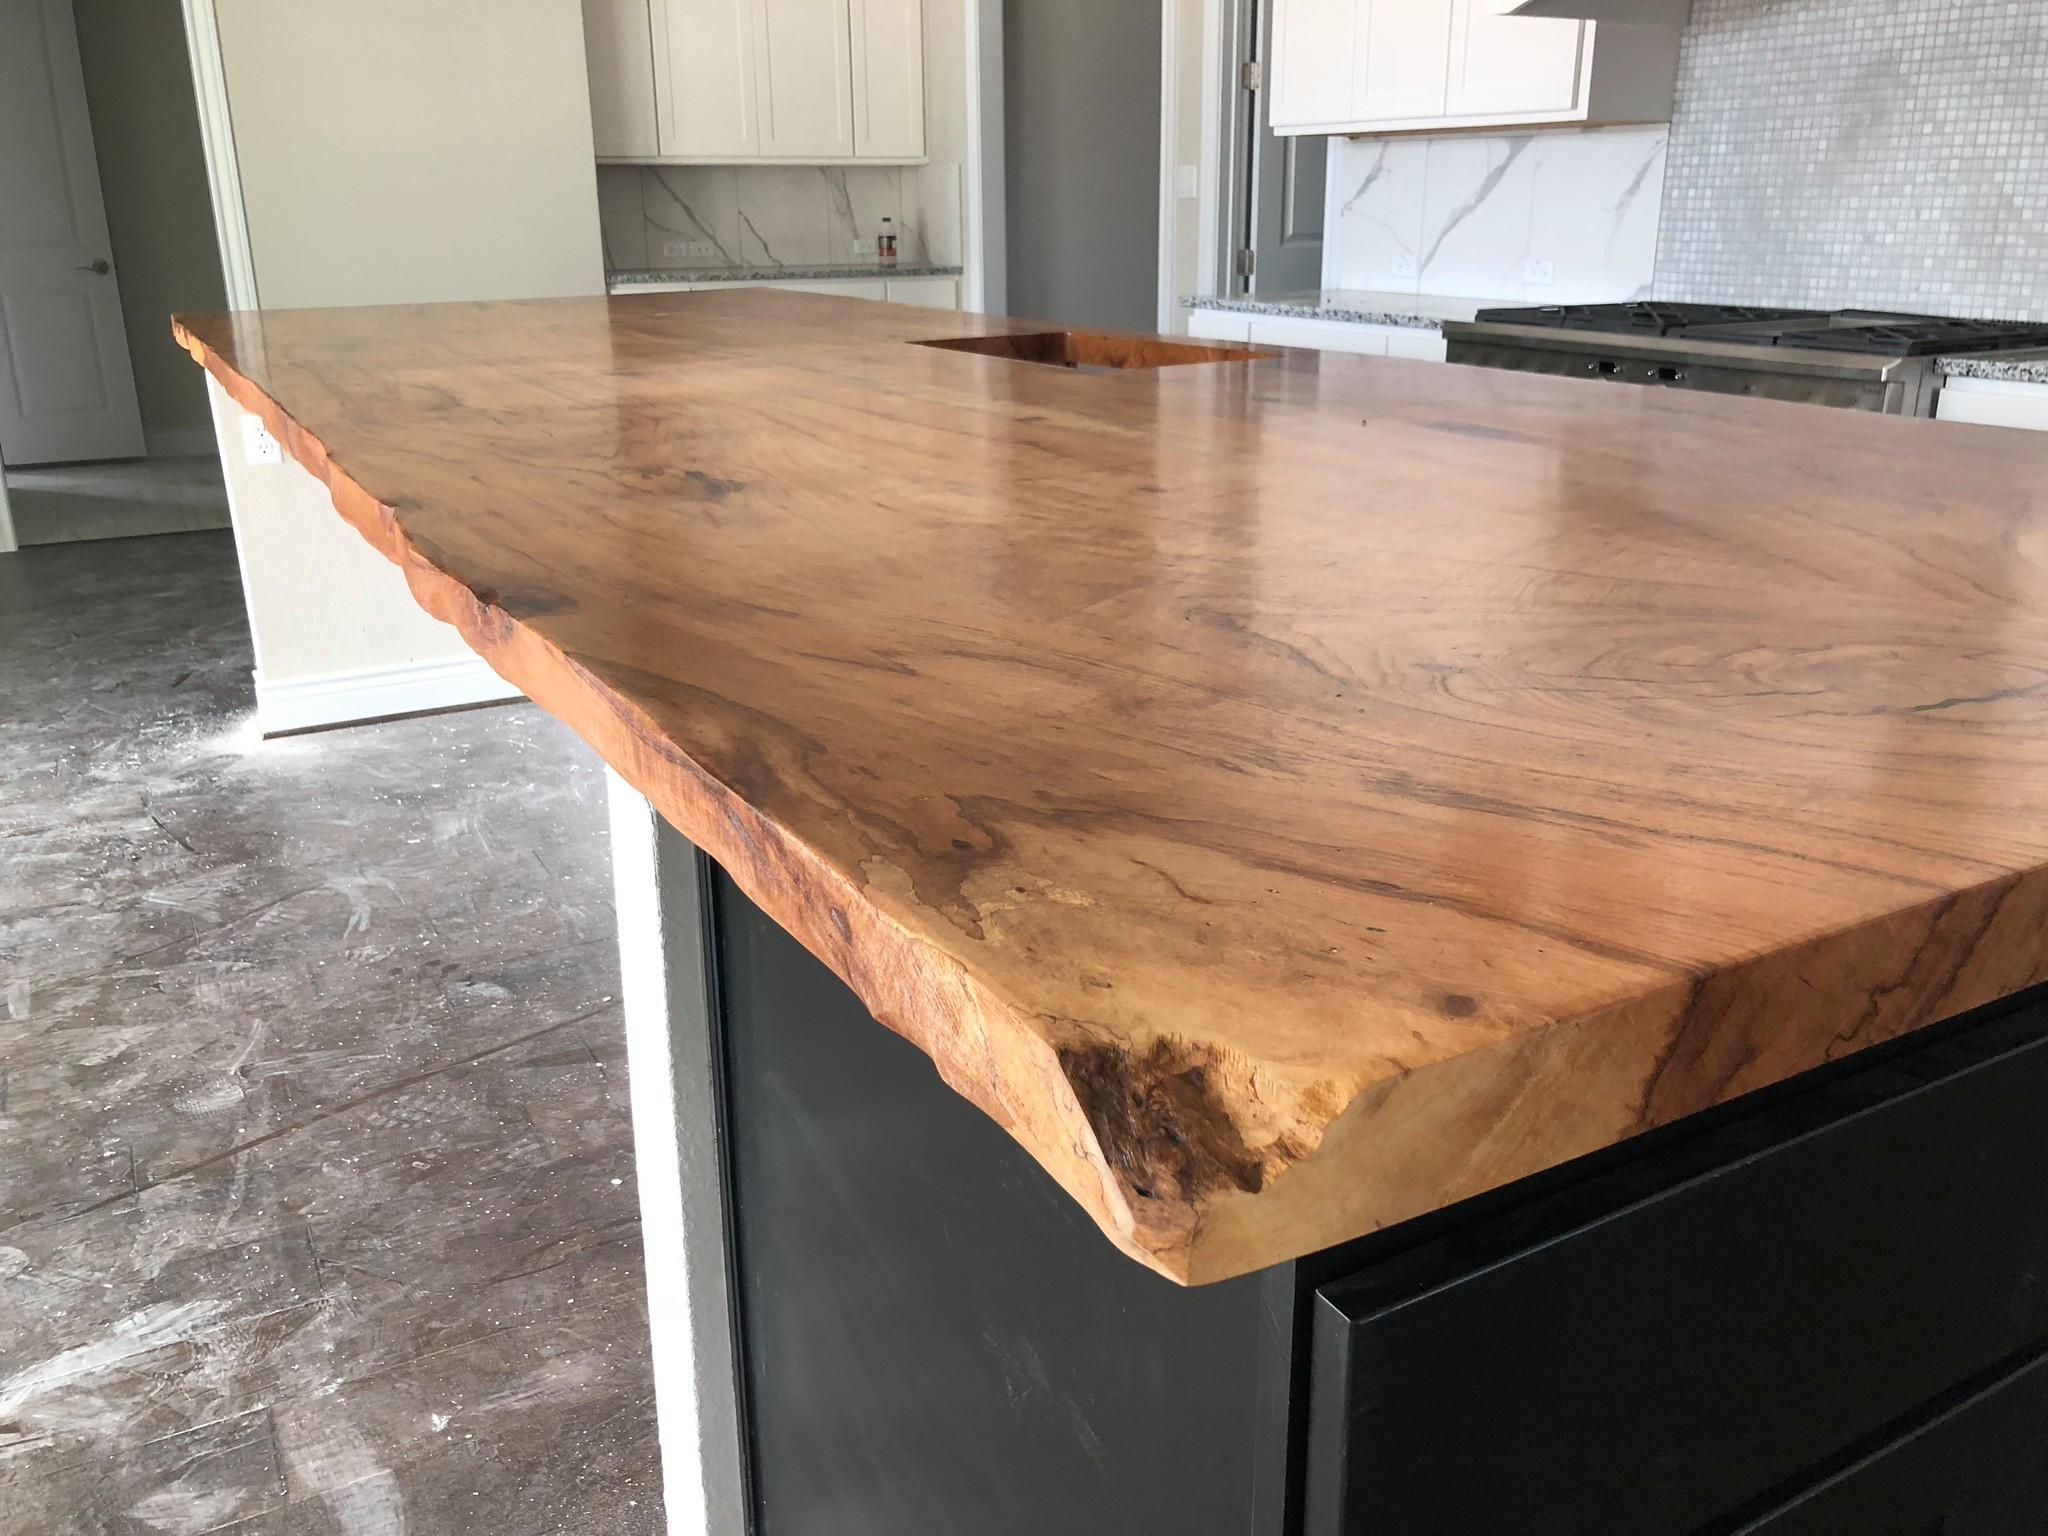 Live Edge Slabs Create Beautiful Counter tops